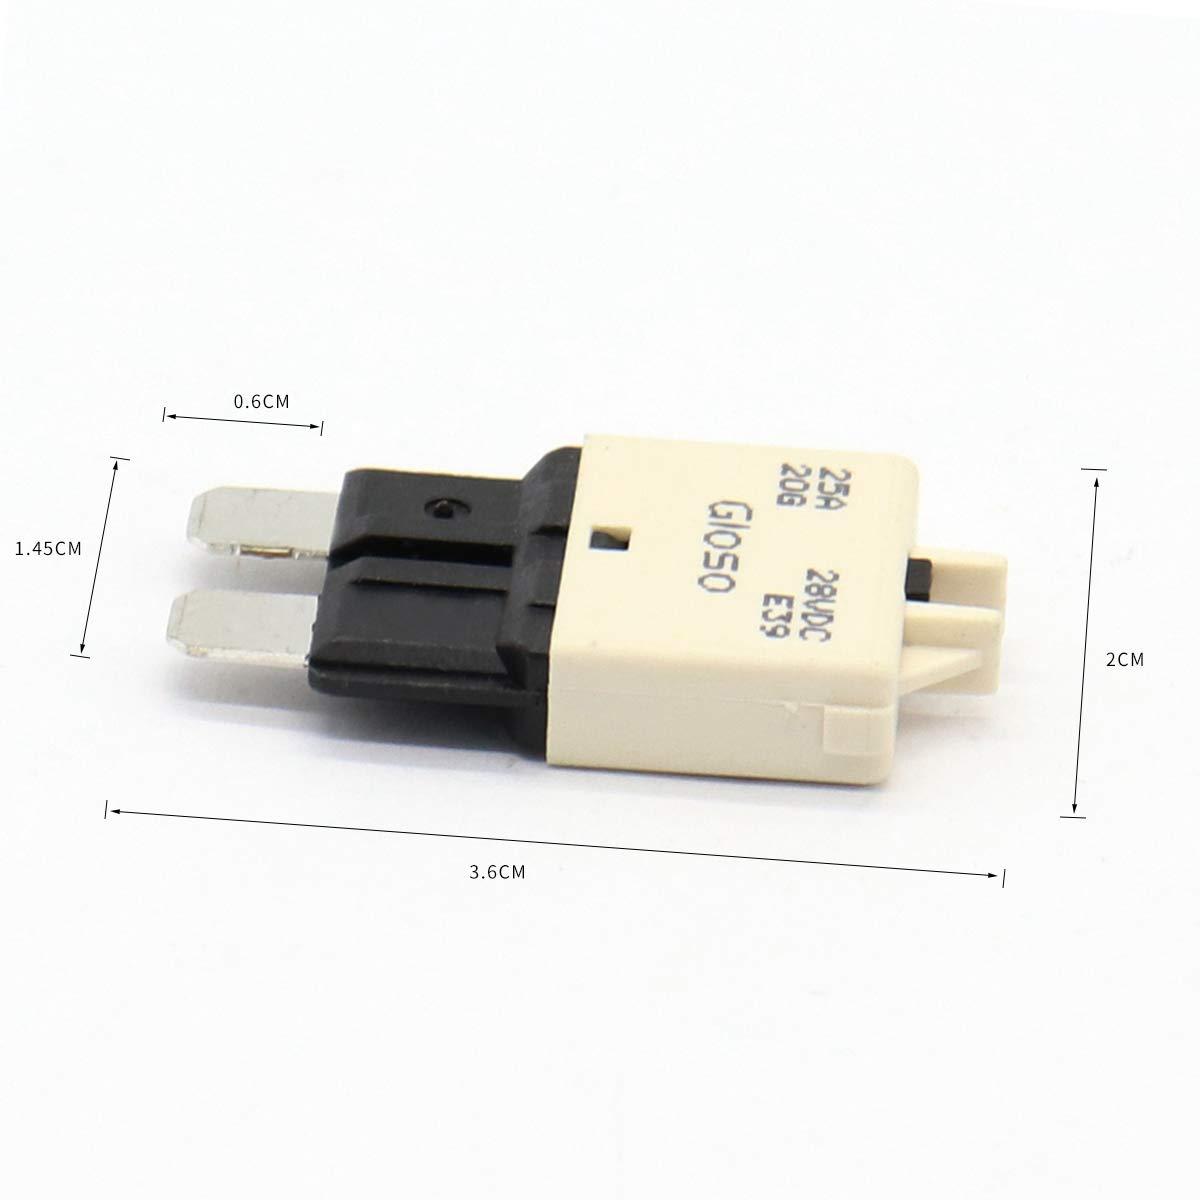 amarillo LIOOBO 20A 28V DC Fusible de cuchilla Mini Interruptor de circuito Restablecimiento autom/ático Rally marino de ATM Fusible